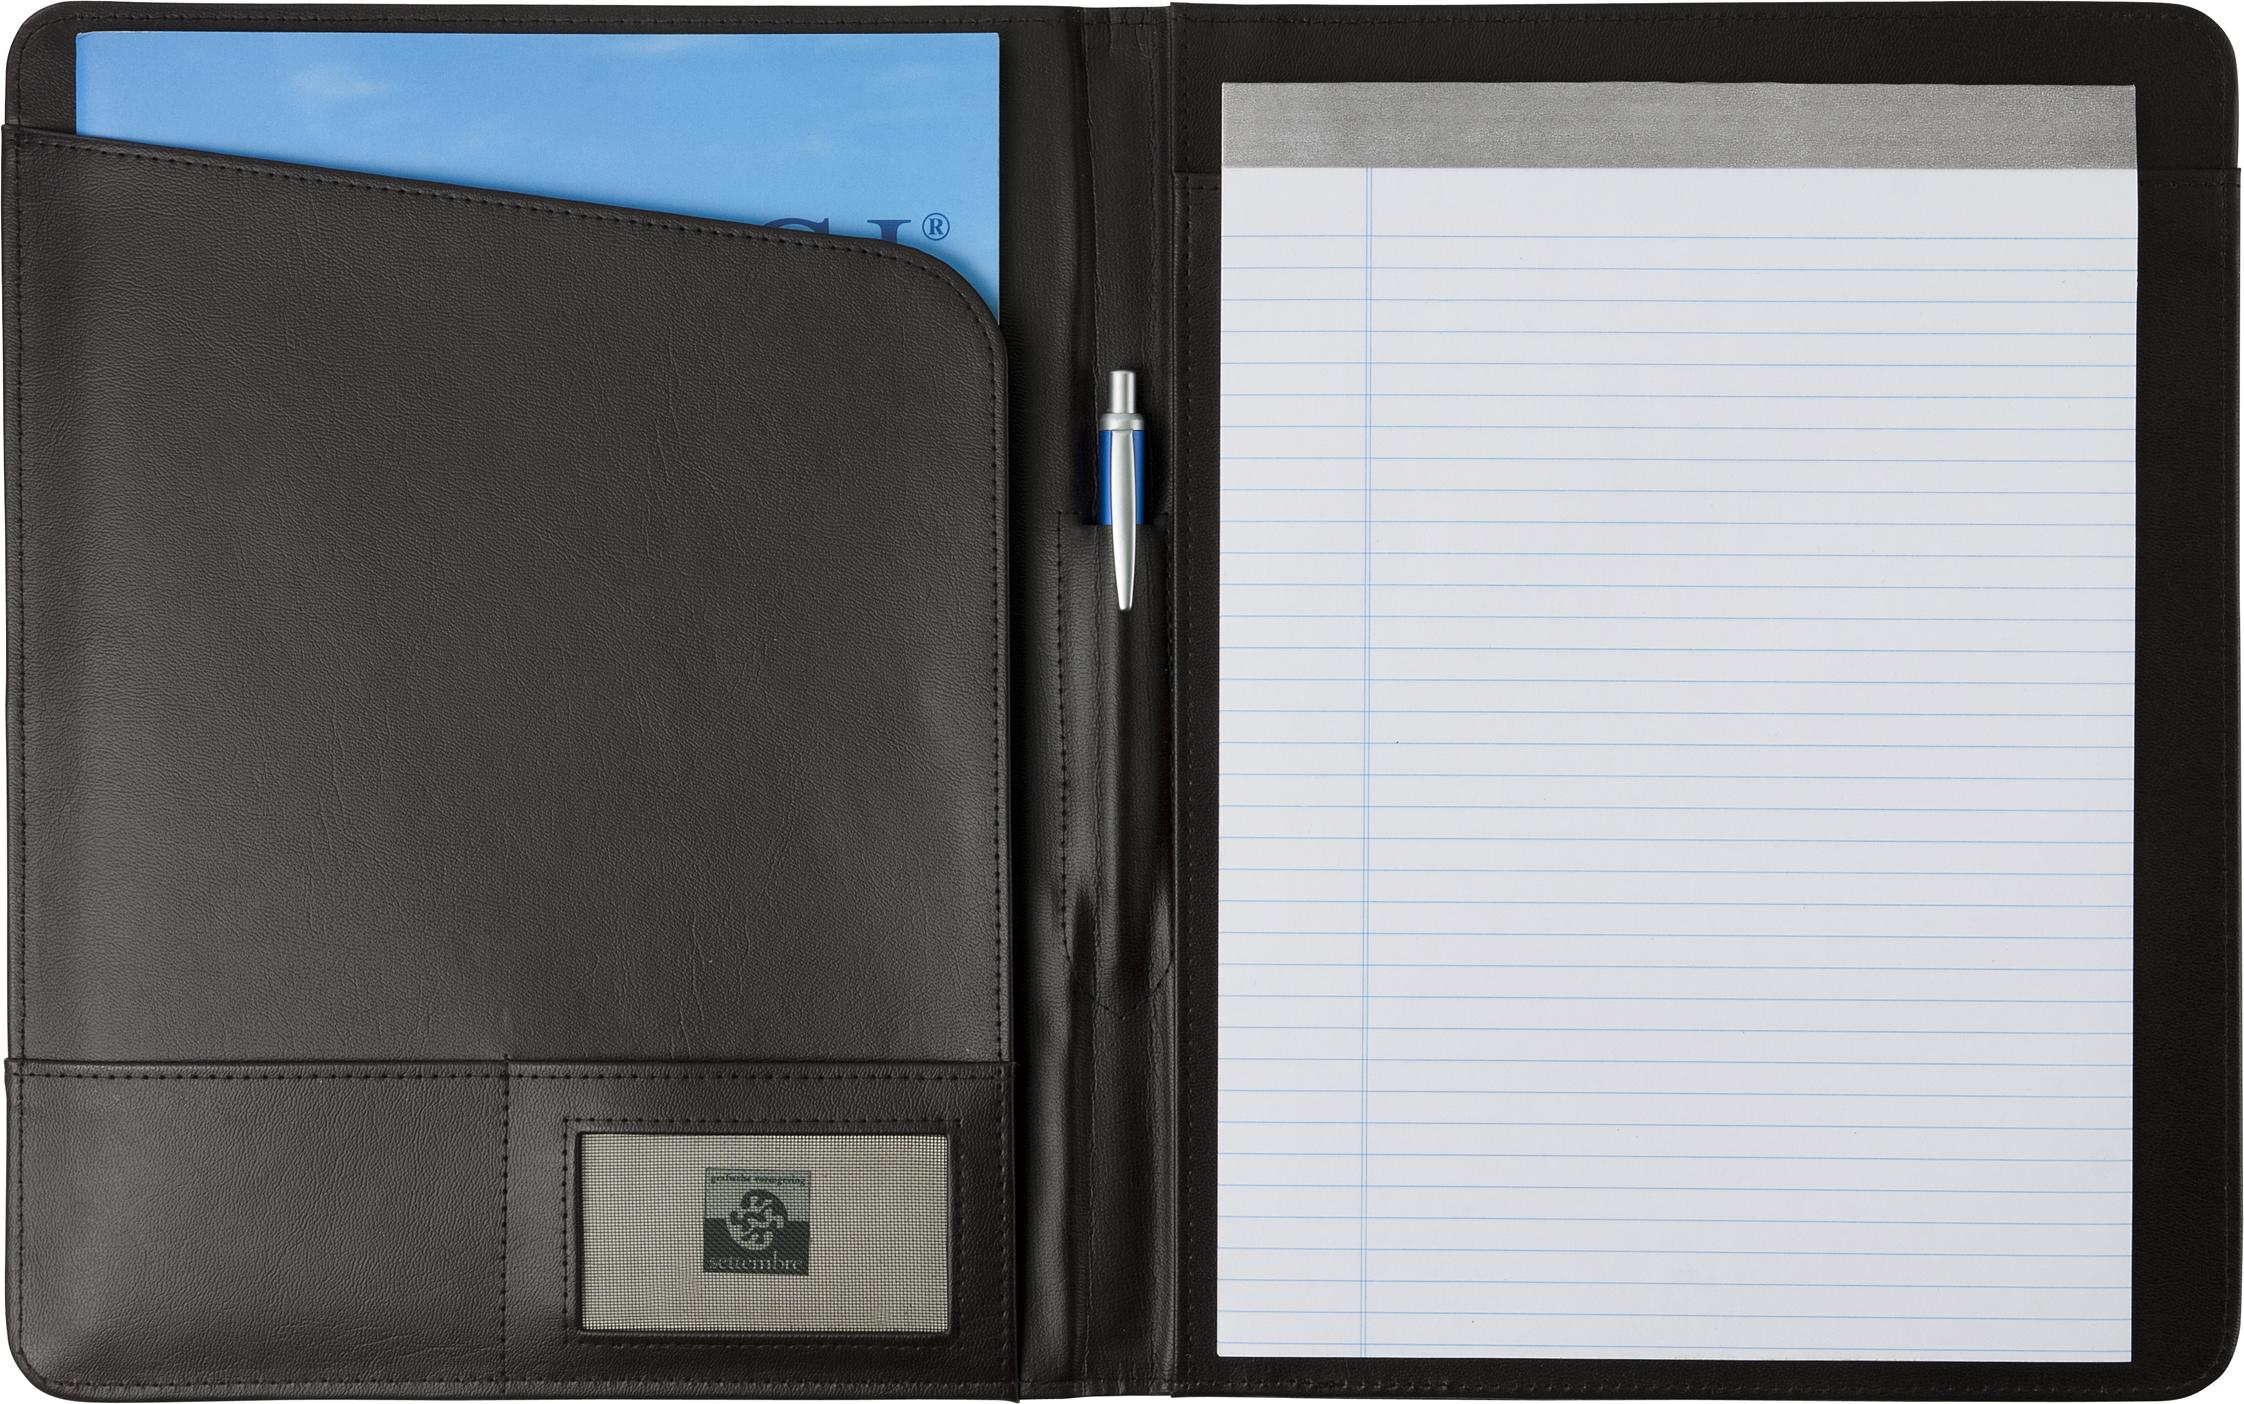 Promotional A4 Bonded leather folder.